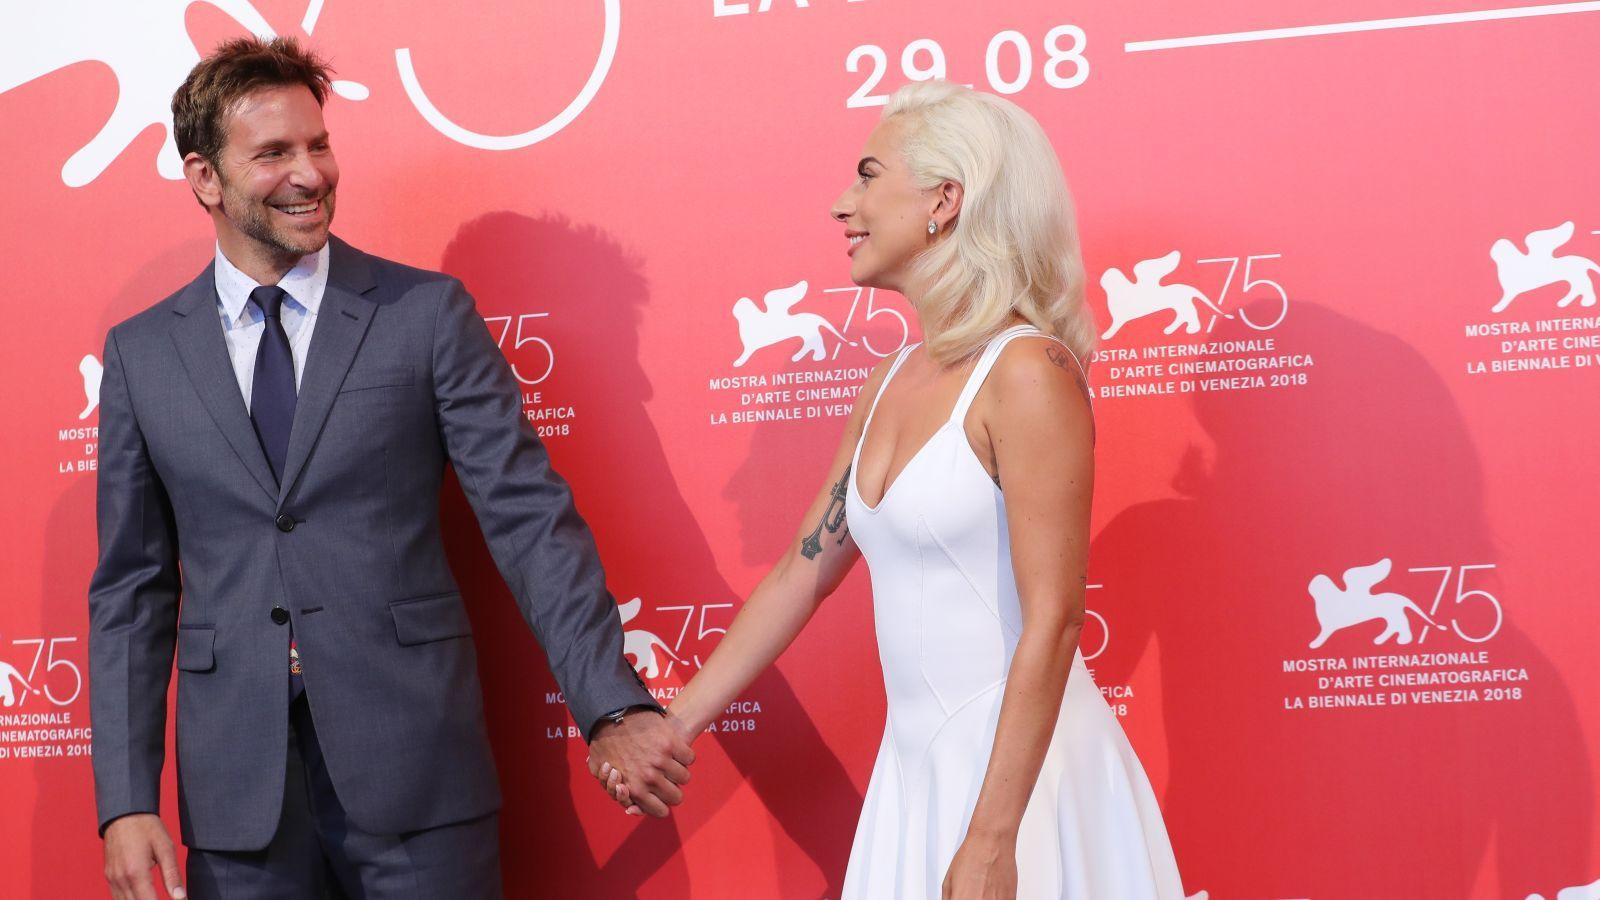 برادلي كوبر في موعد الغرامي وكيف أصبحت ليدي غاغا رجل بالستين صور Lady Lady Gaga Premiere